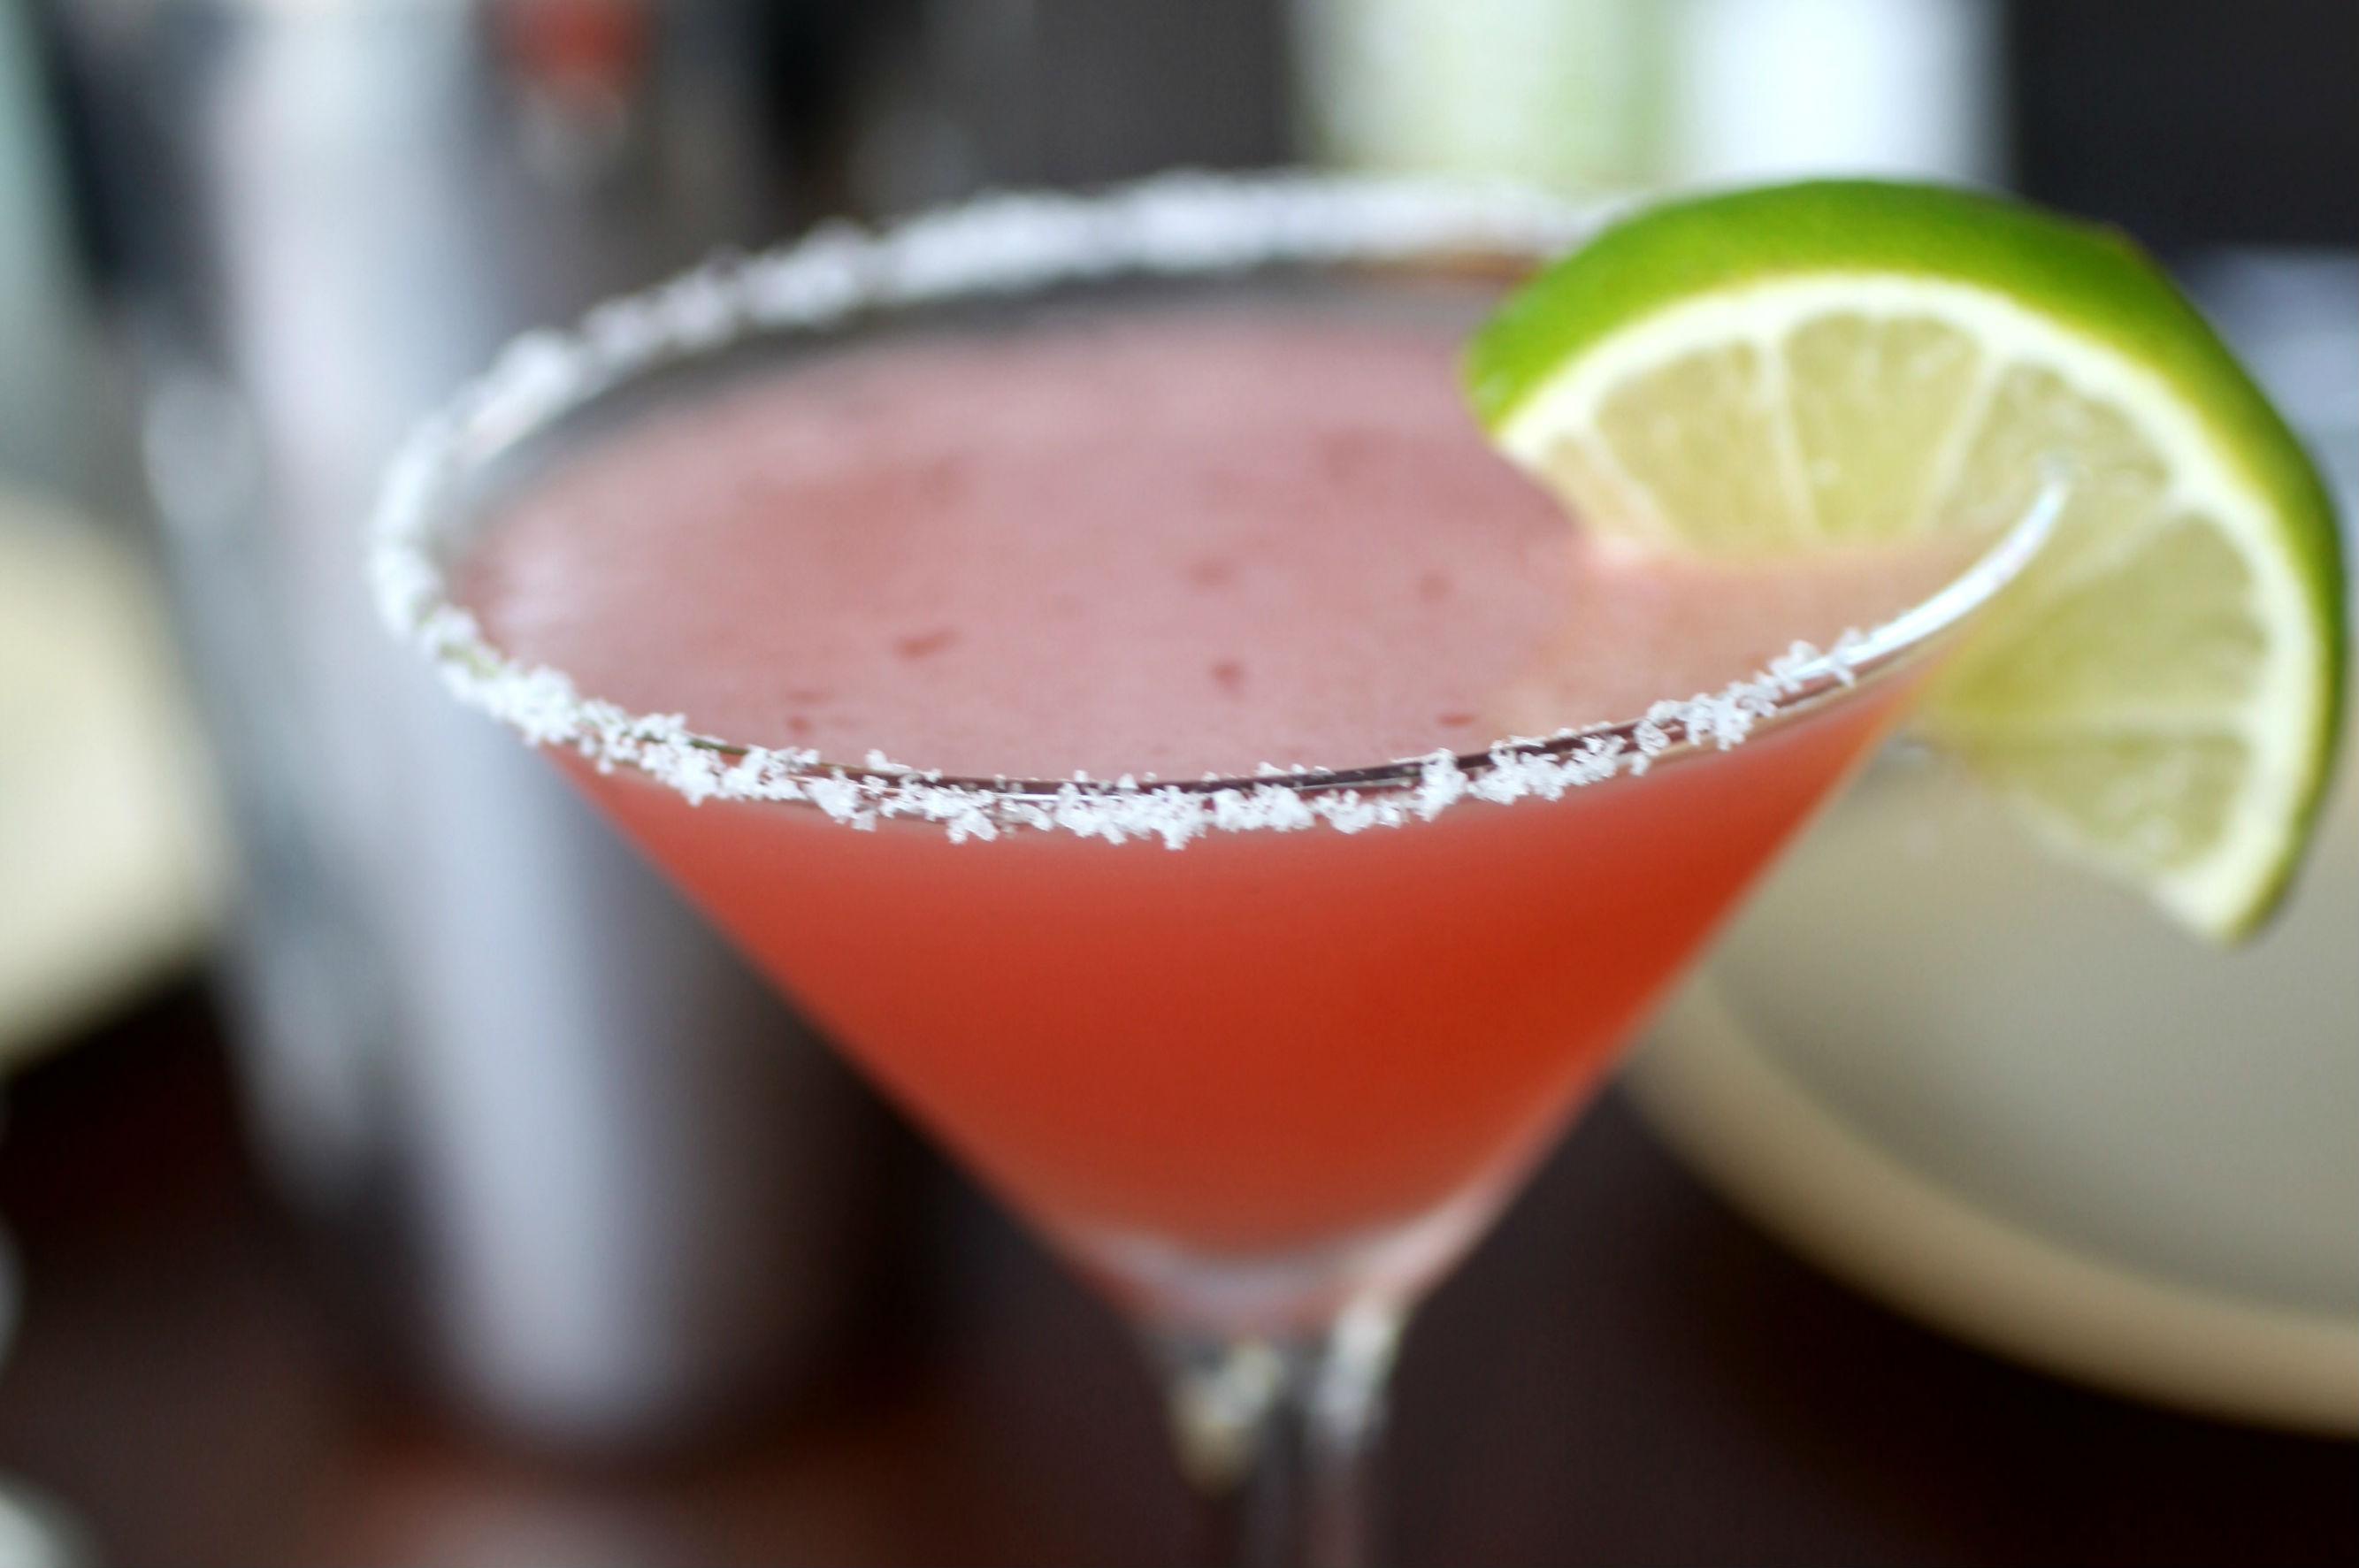 Frontera Grill's Mezcal Margarita